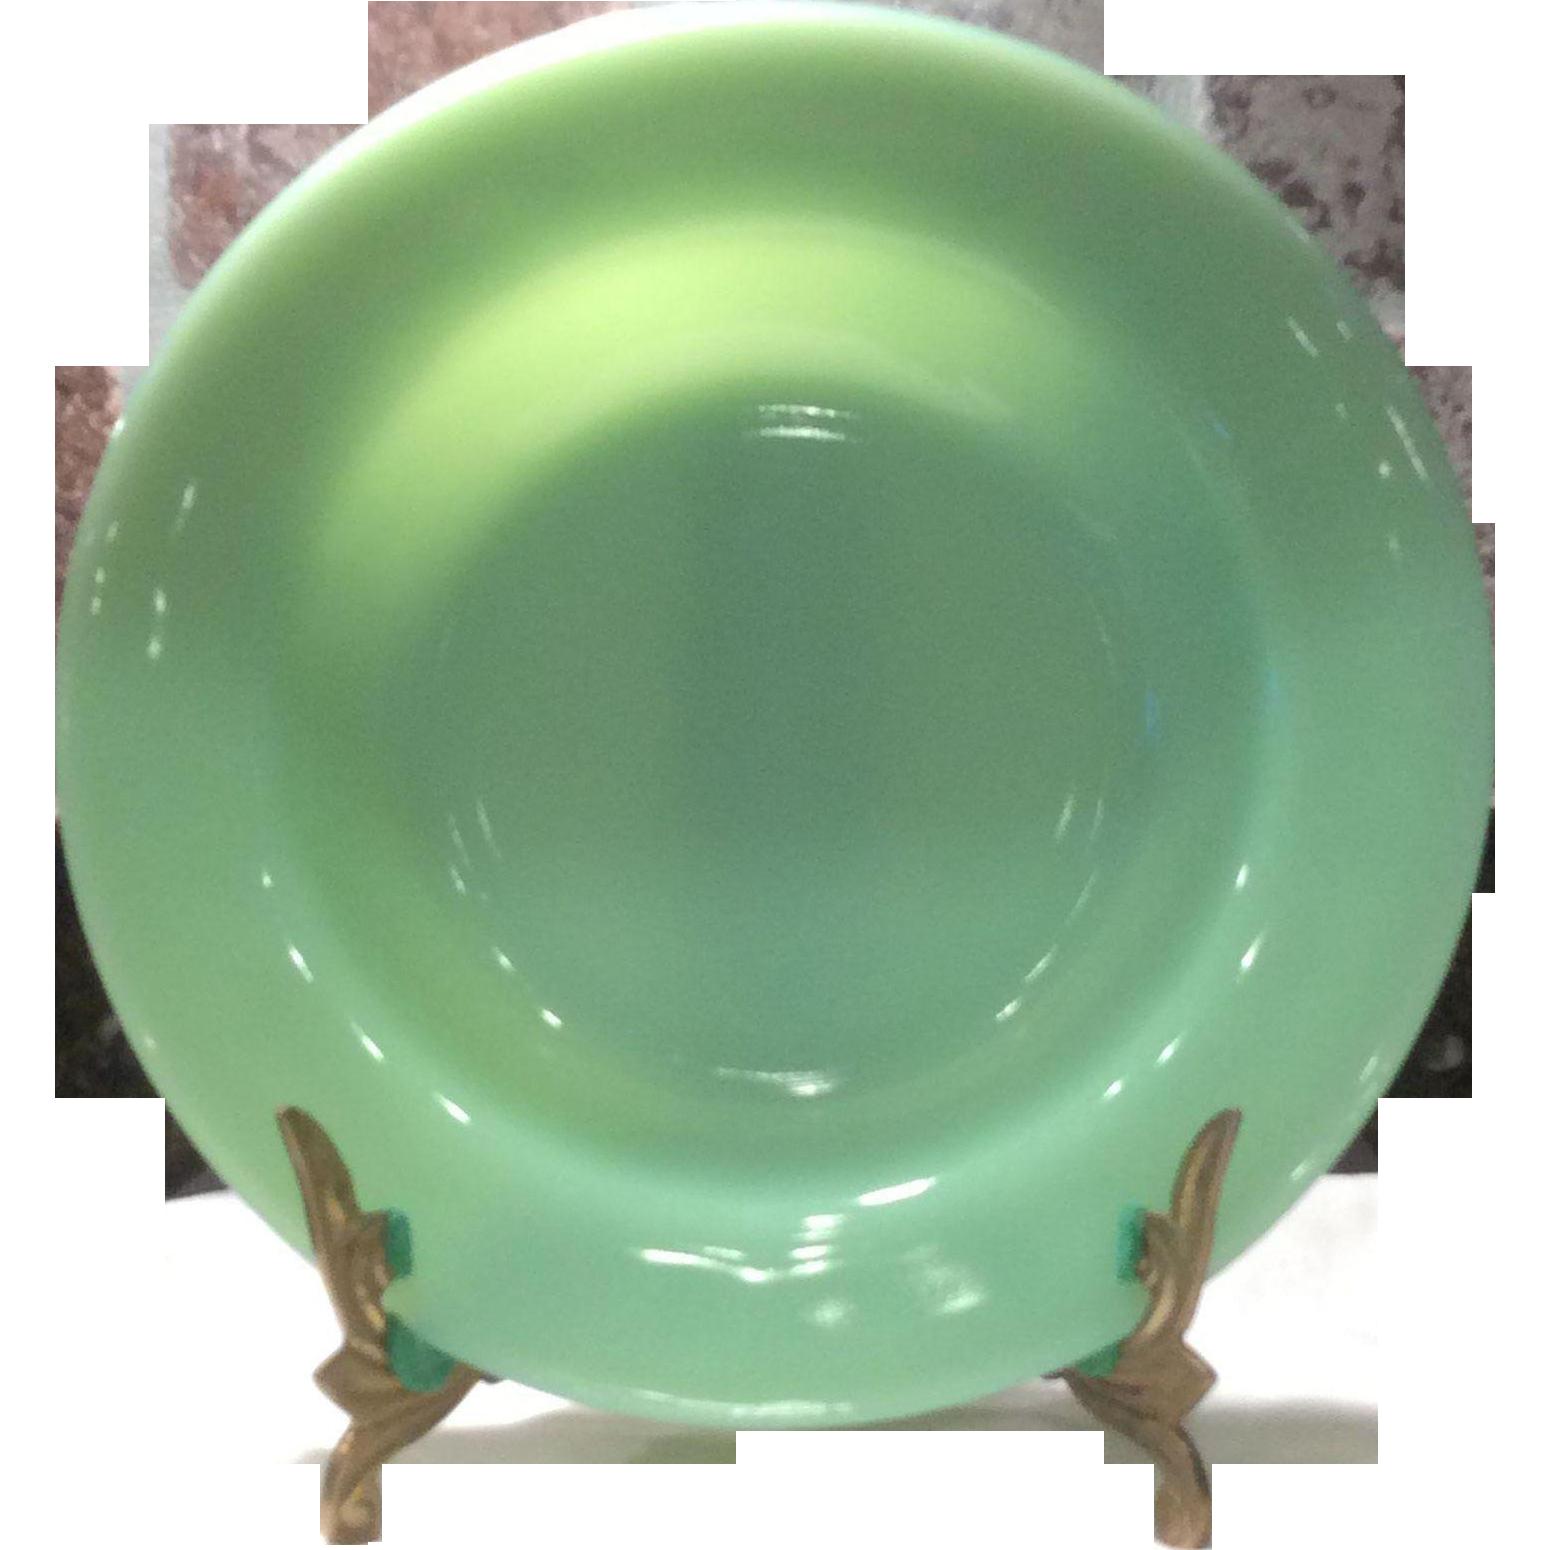 "Fire King/Anchor Hocking Jadeite (Jadite) 9"" Flat Rim Restaurant Ware Soup Bowl"